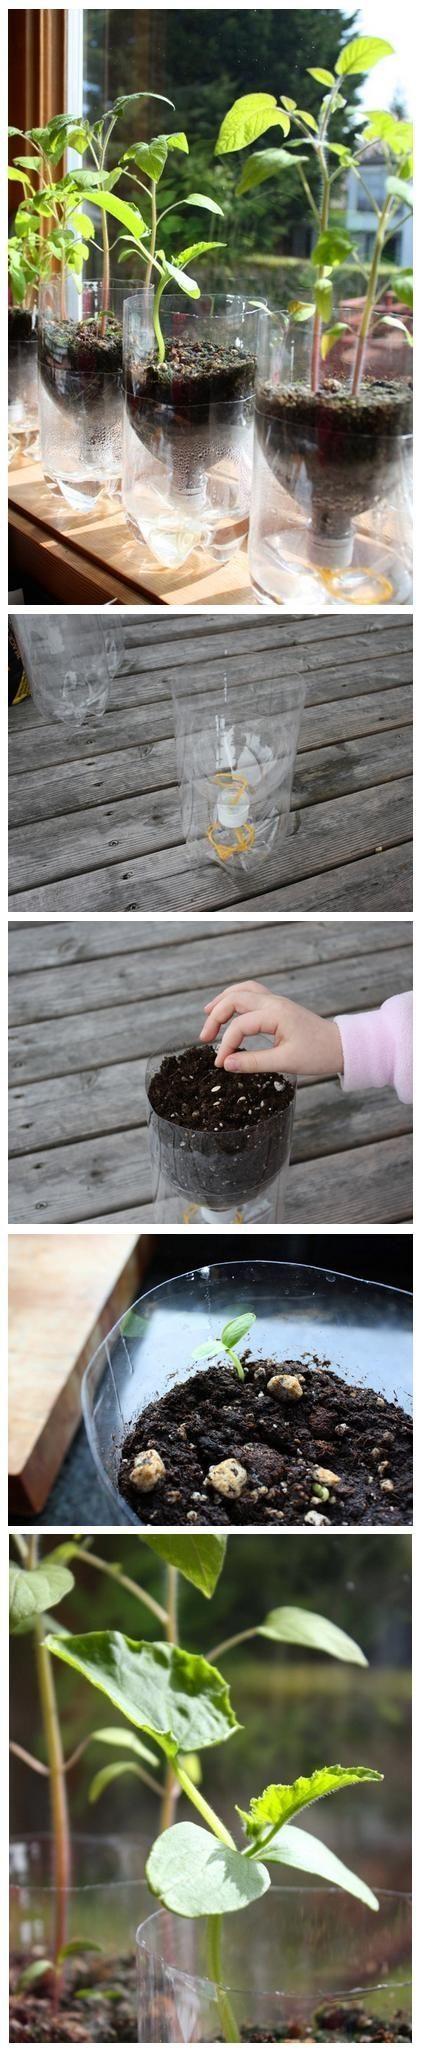 Self-Watering Seed Starter Pots – Tutorial